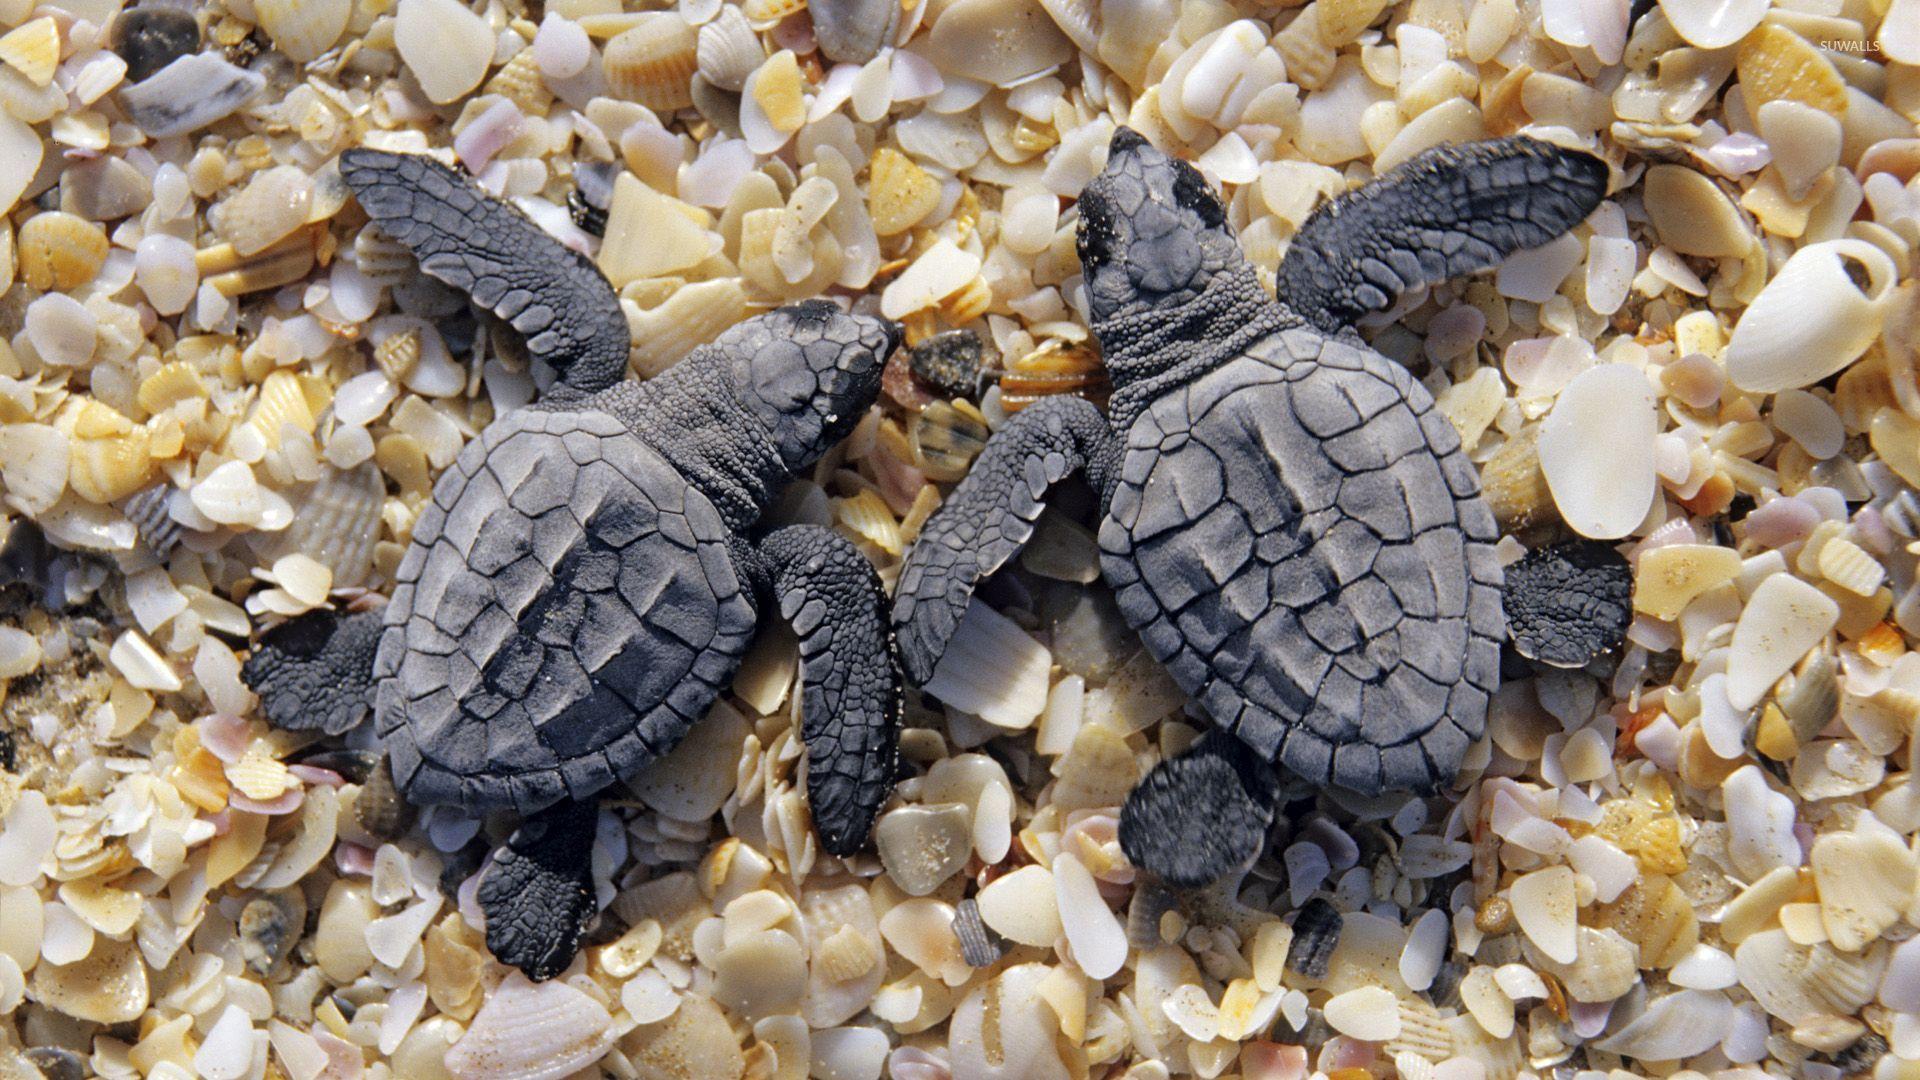 Sea turtles on shells and pebbles